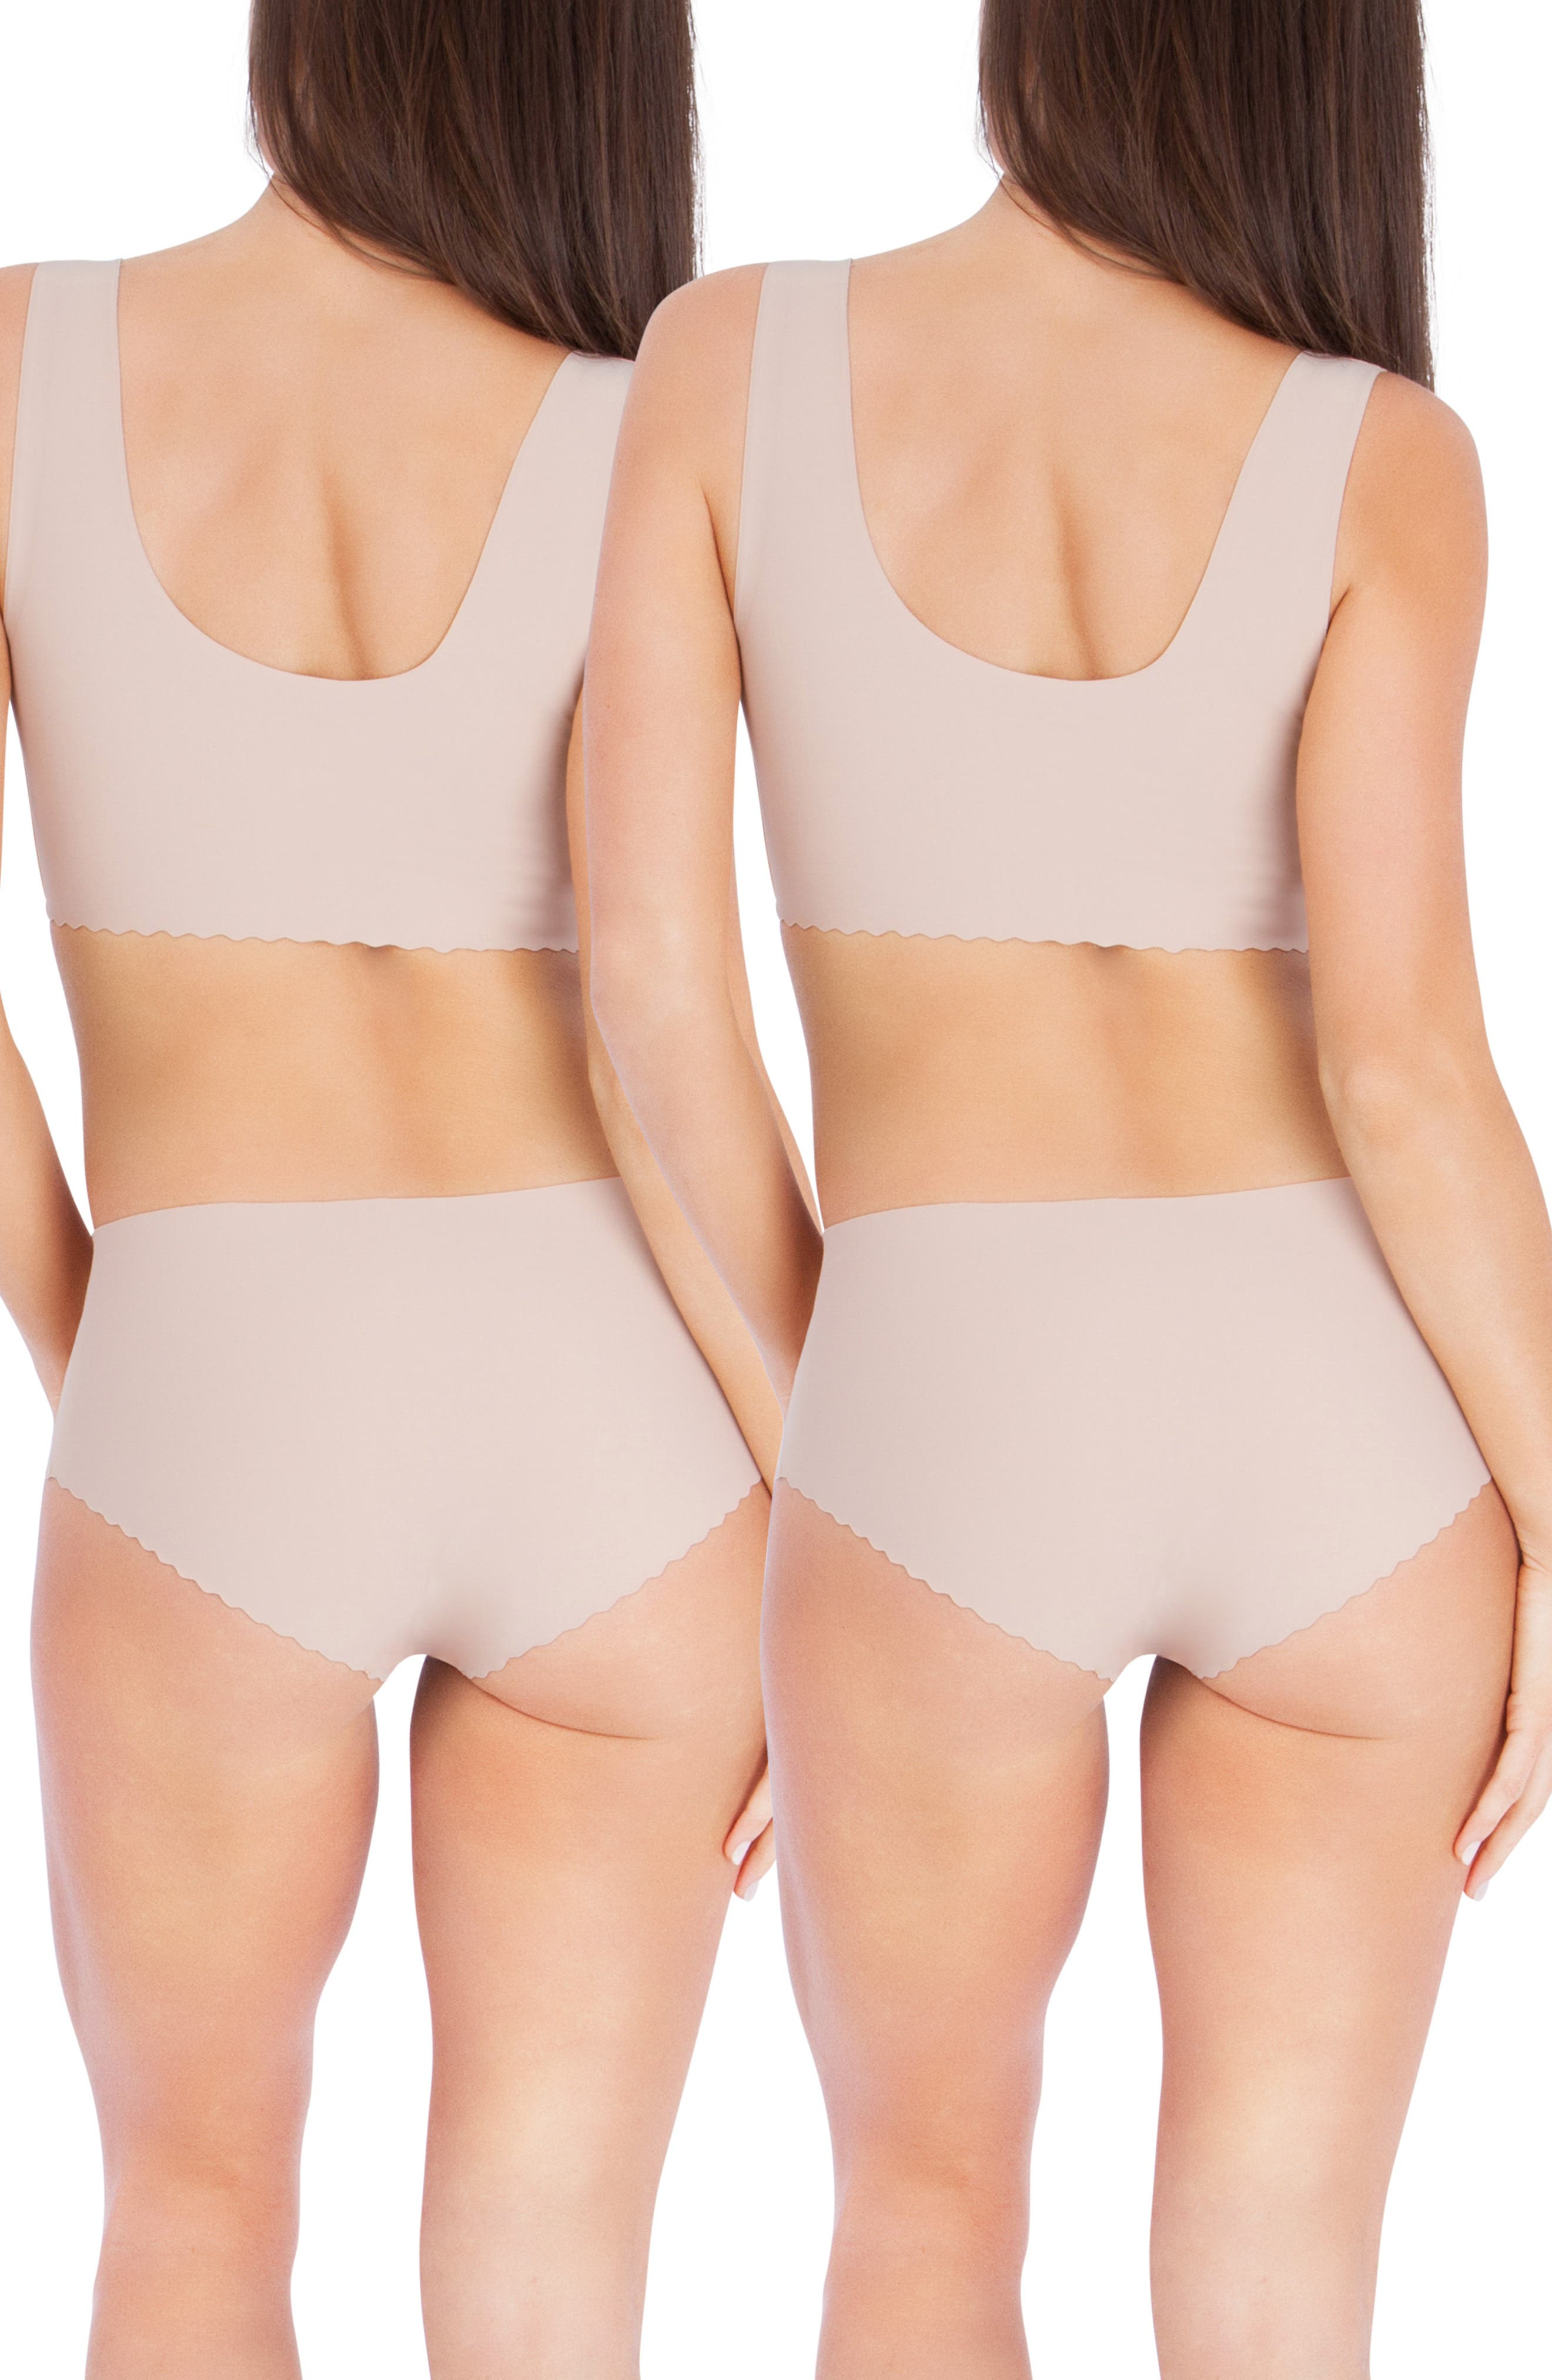 15d43ef213a94 Women's Panties Maternity Lingerie | Nordstrom